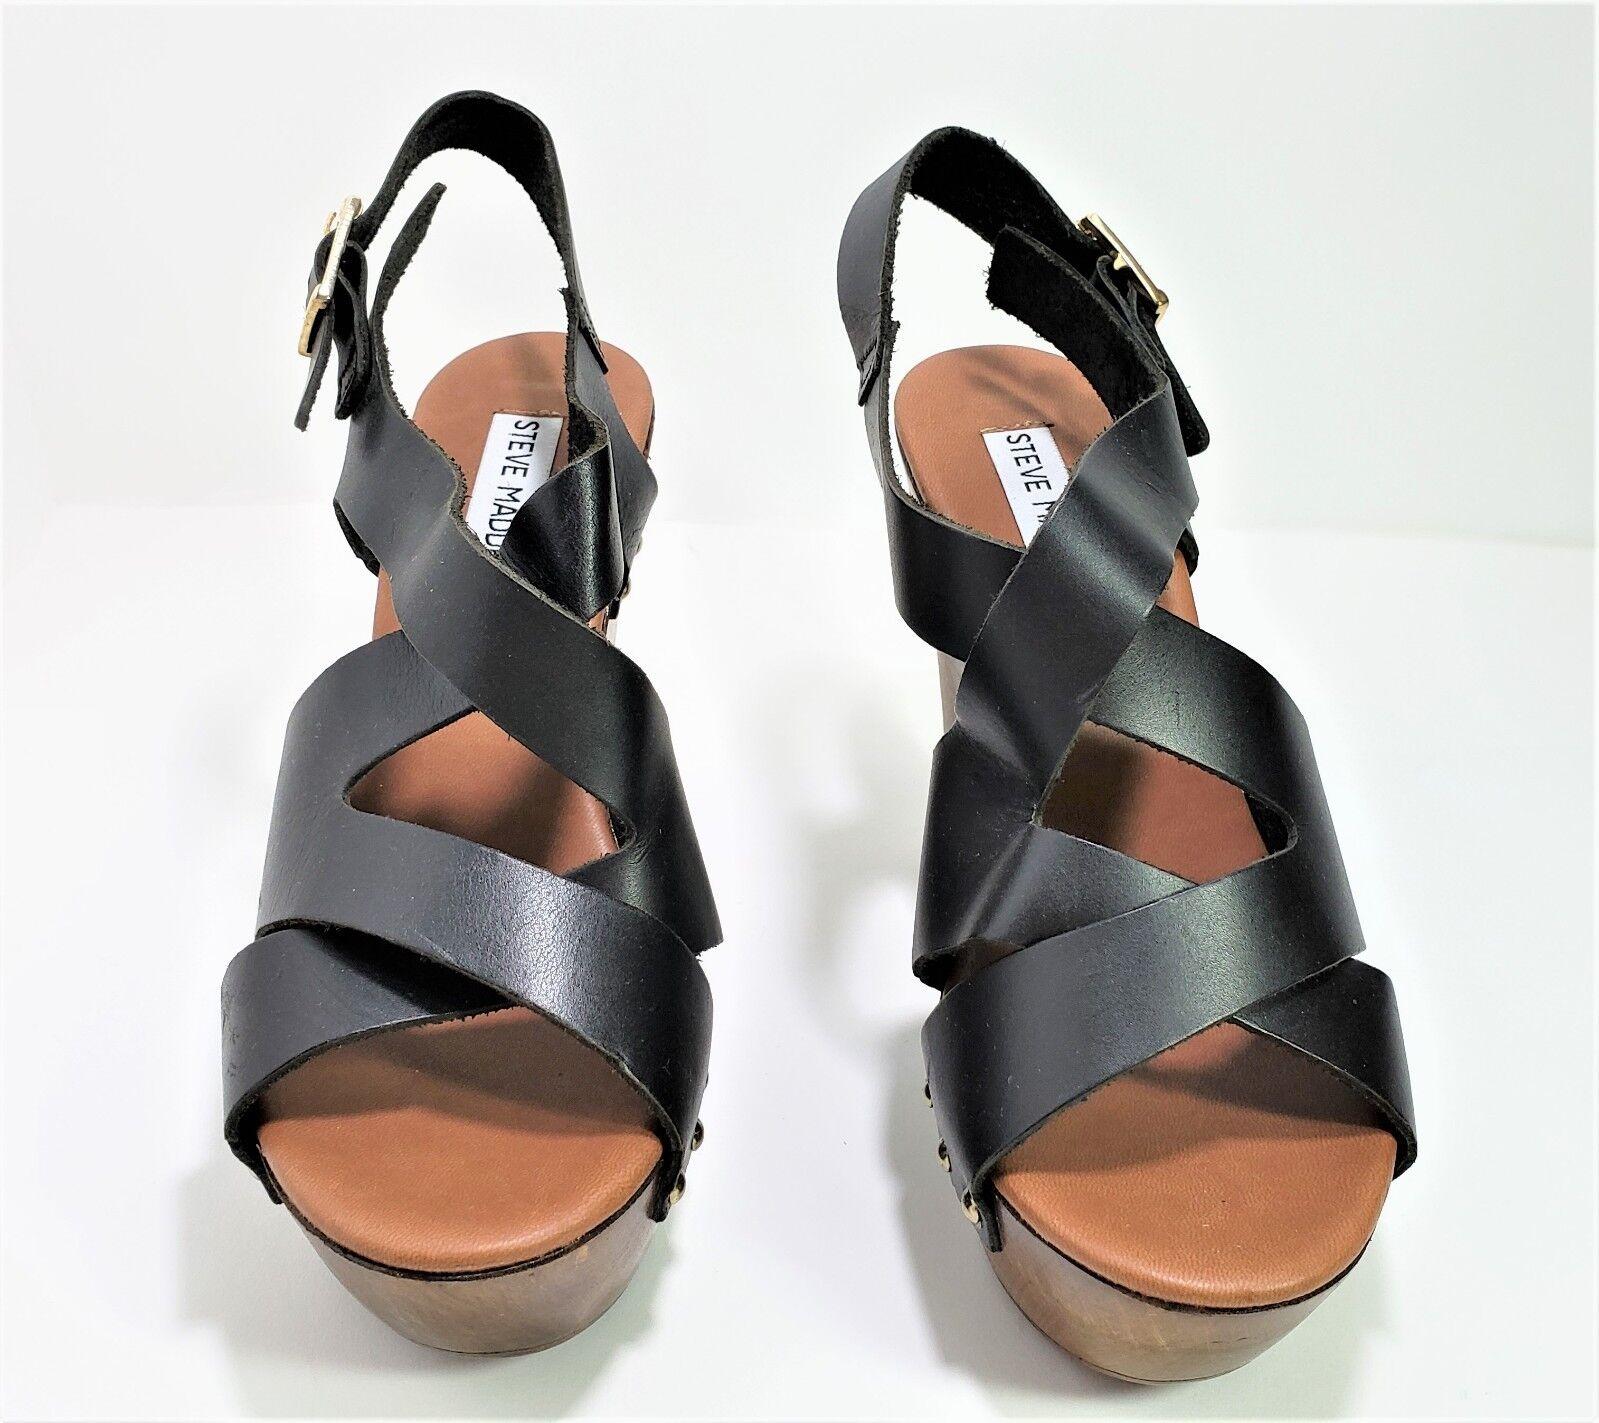 Steve Madden Strappy Sandales 4 6 ½ inch Heels Größe 6 4 21169b